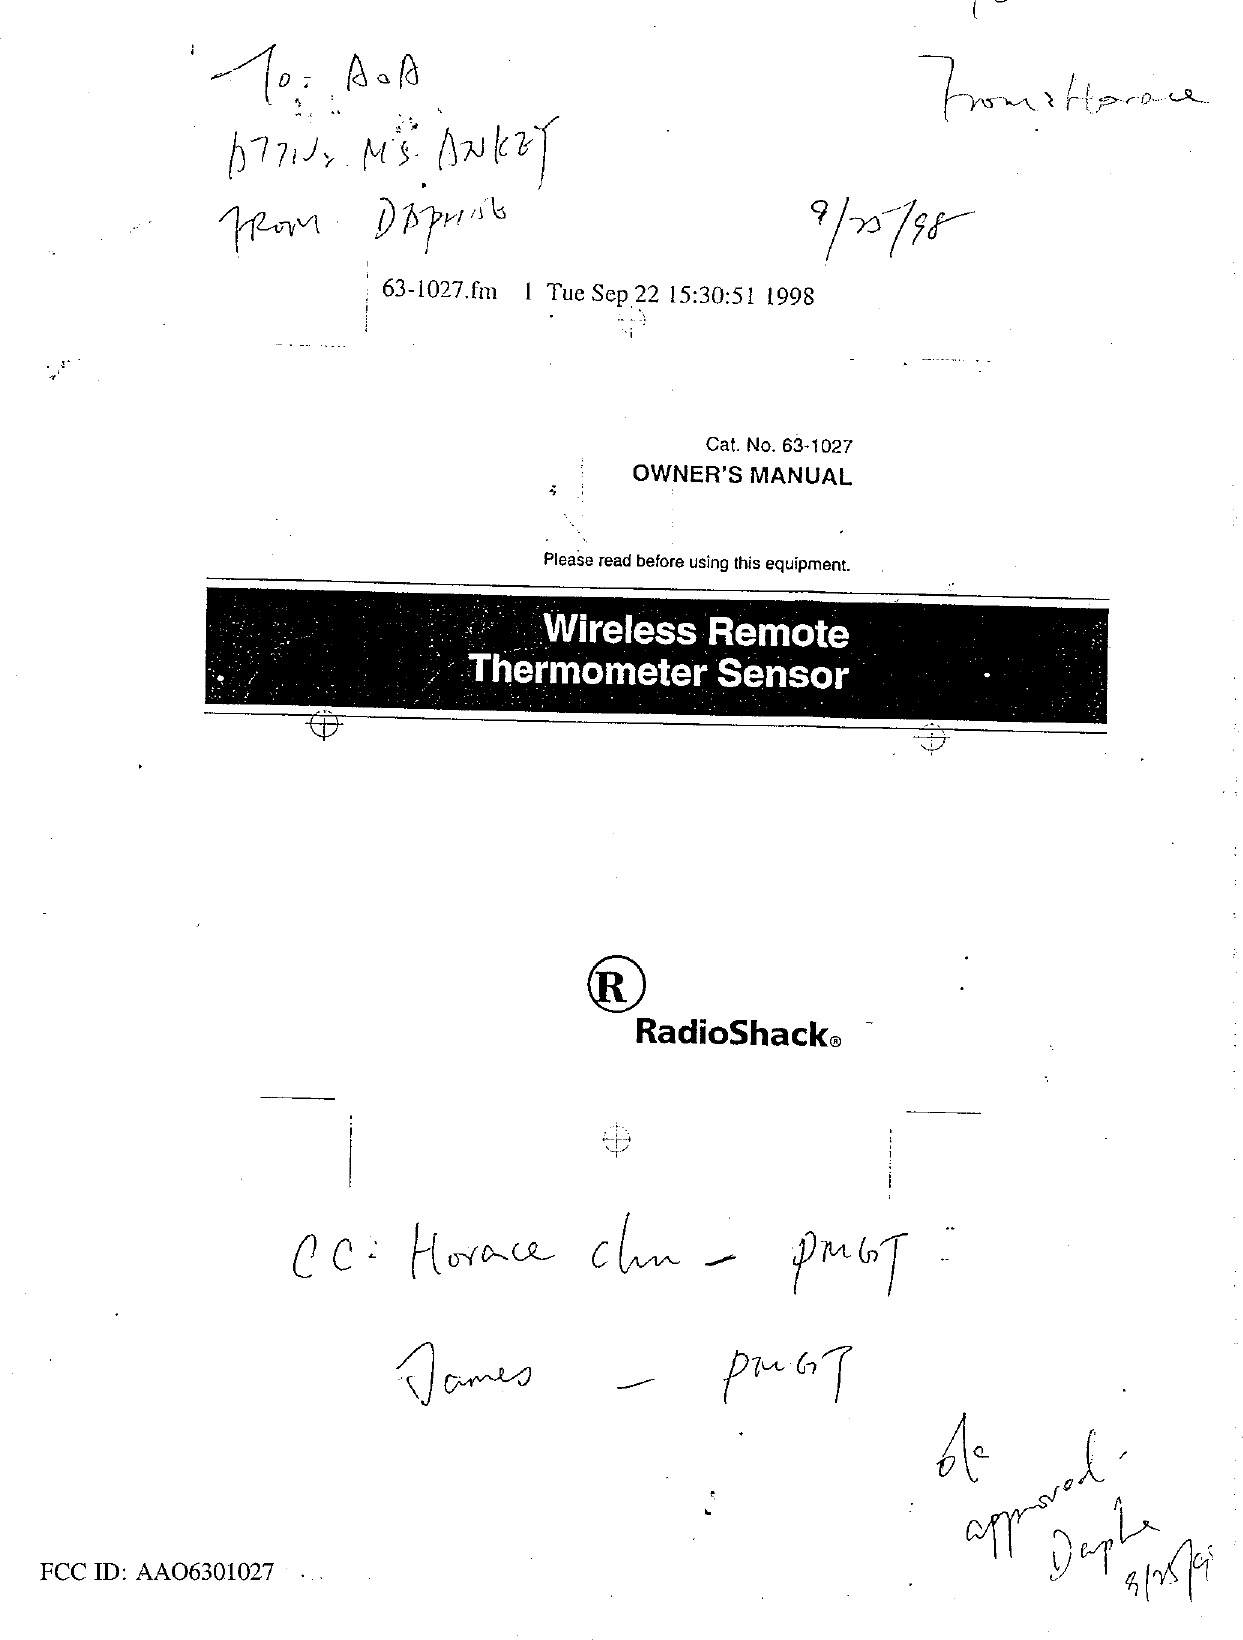 Radio Shack 6301027 WIRELESS REMOTE THERMOMETER SENSOR